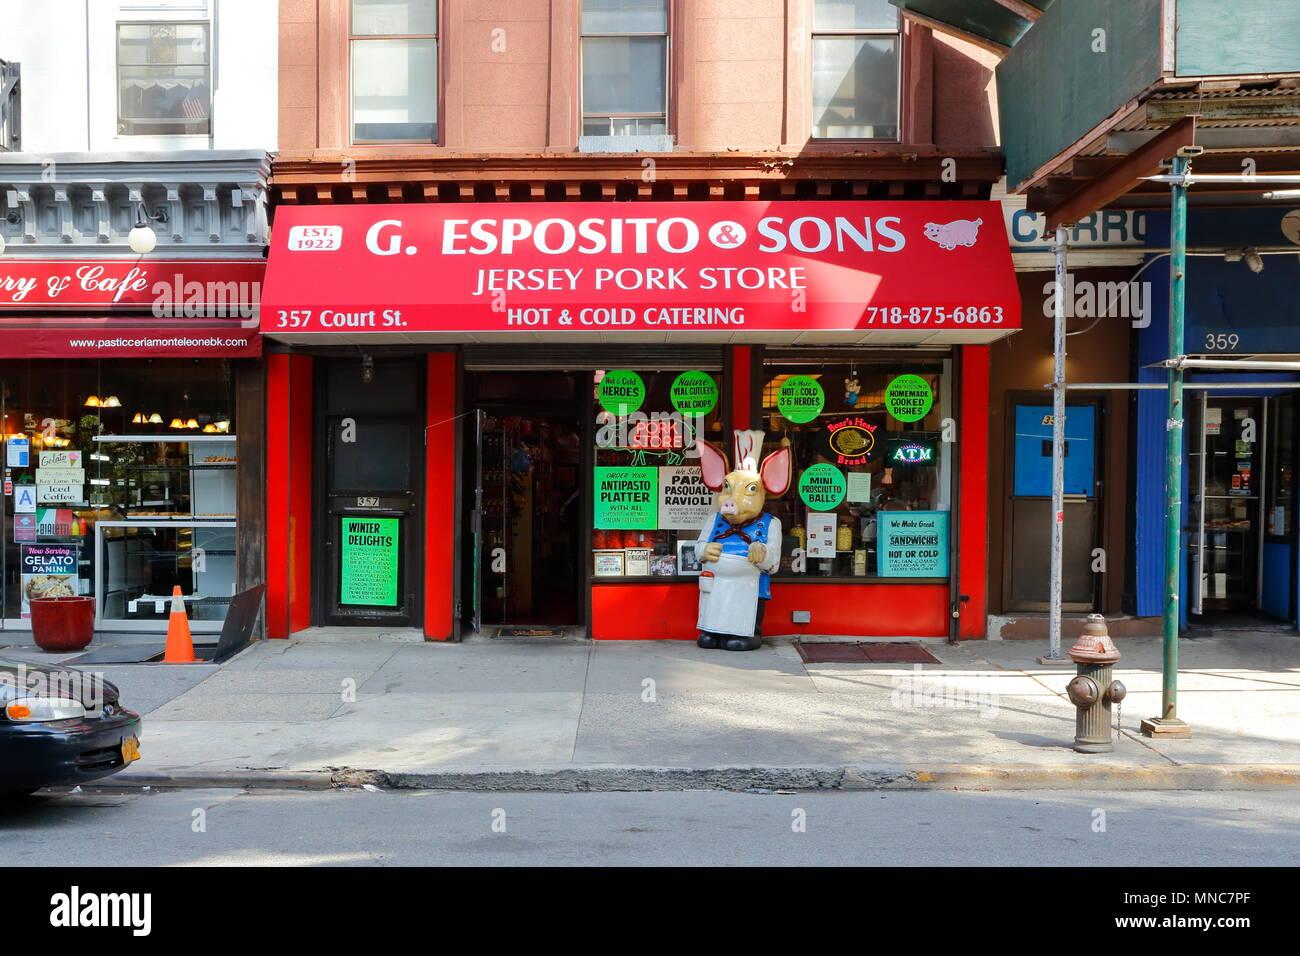 Esposito & Sons Pork Store, 357 Court St, Brooklyn, NY - Stock Image